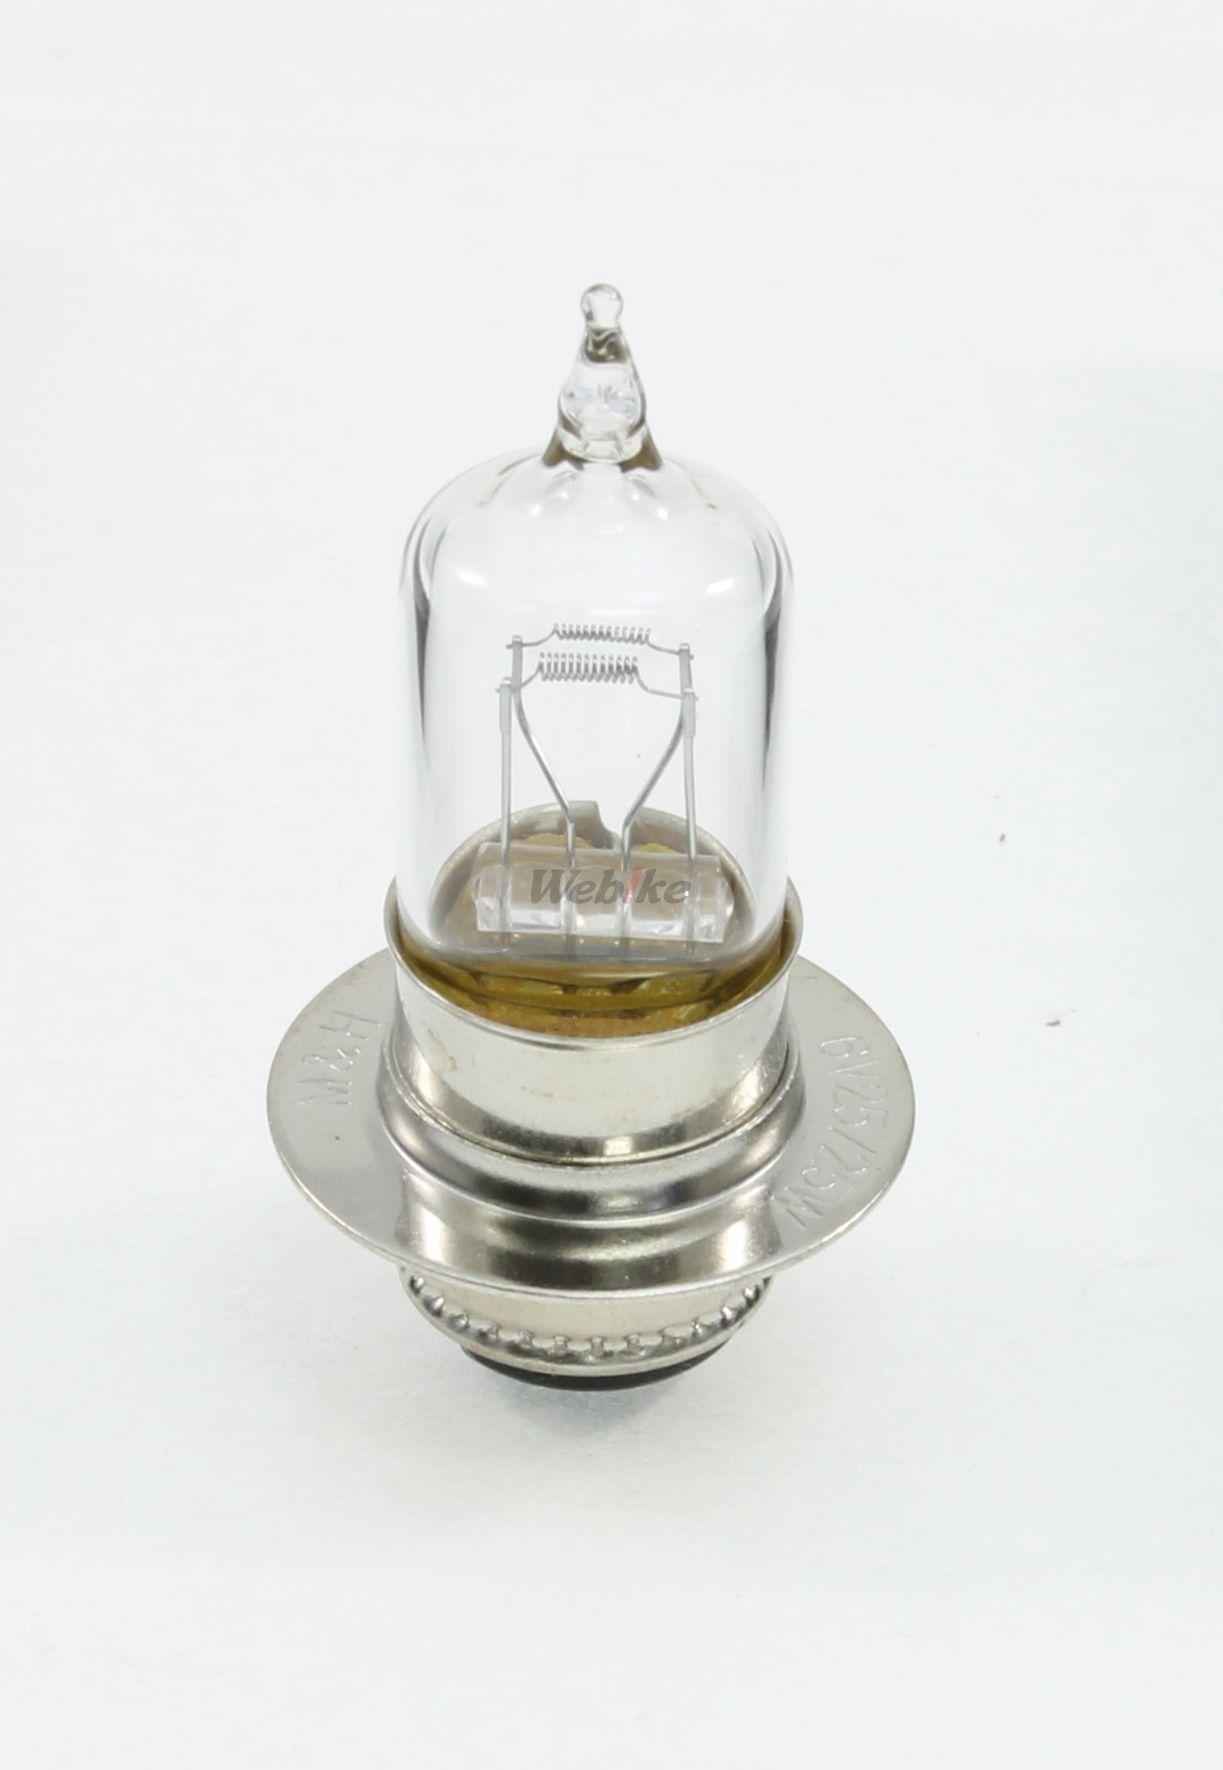 【M&H】標準型鹵素頭燈 PH9 - 「Webike-摩托百貨」